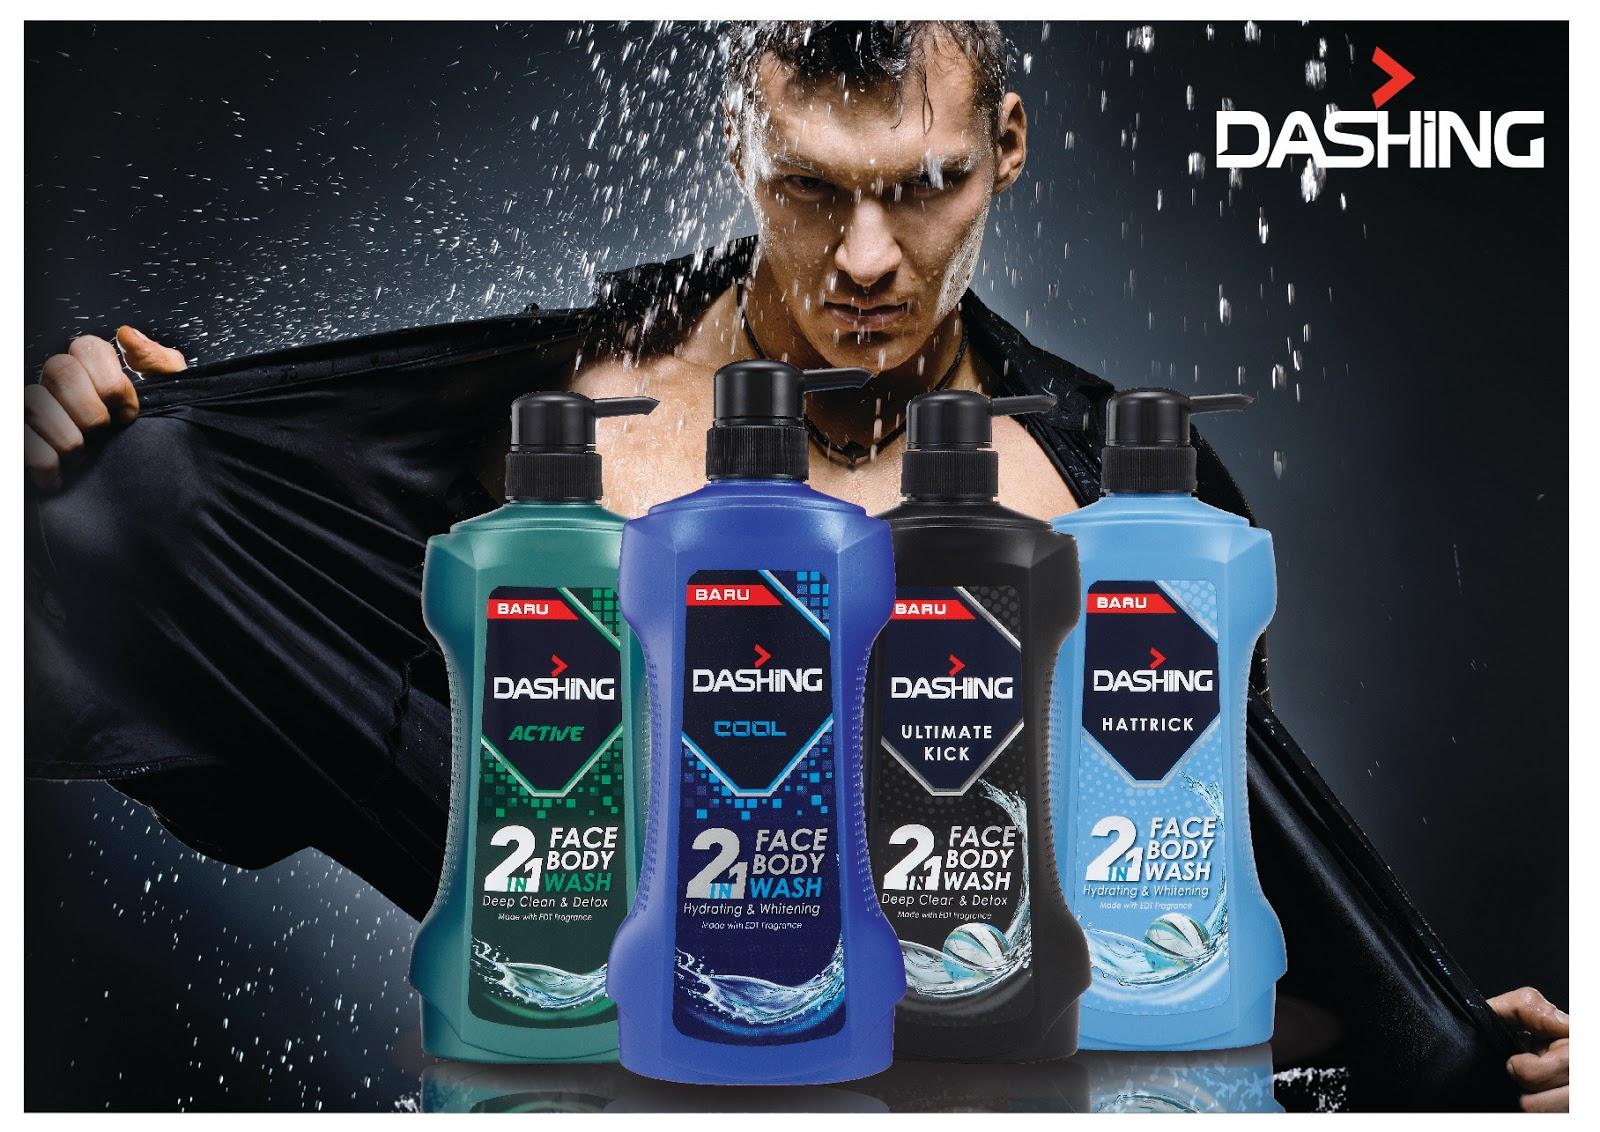 DASHING 2 in 1 Face & Body Wash Mandian Terbaik untuk Lelaki.